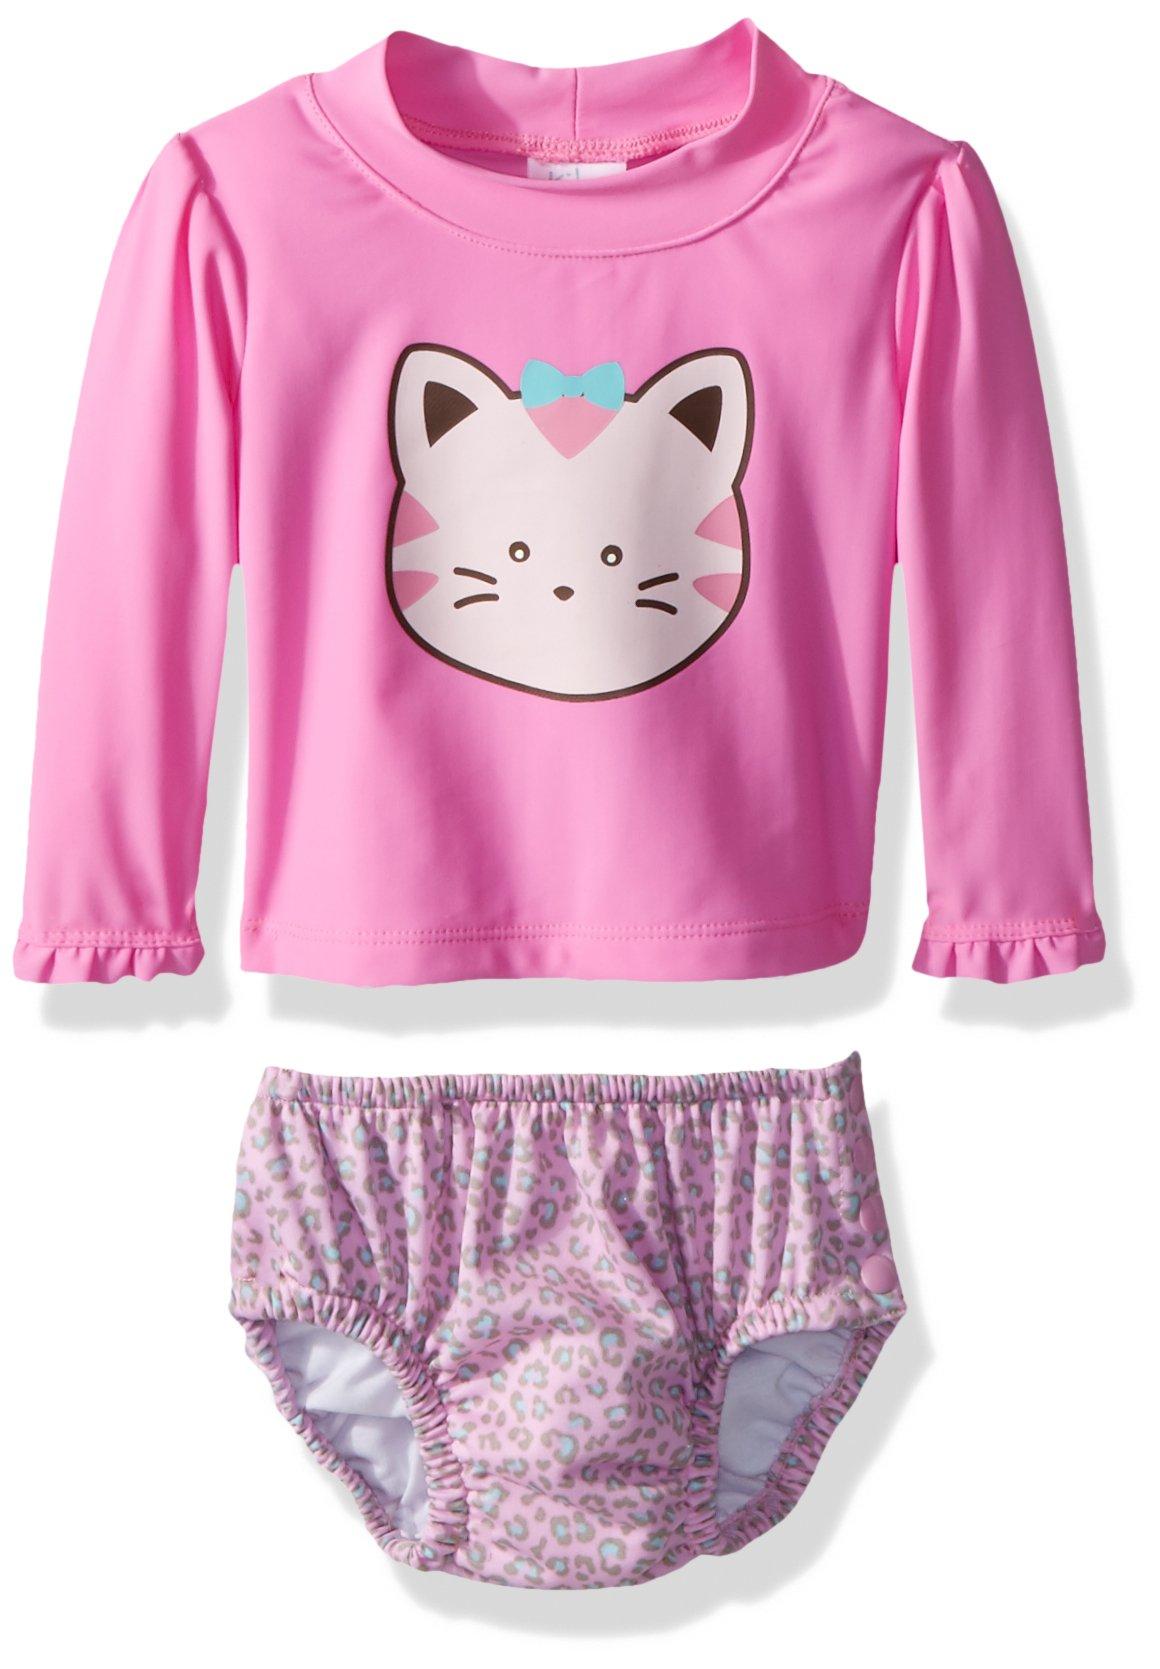 KIKO & MAX Girls' Baby Rashguard and Diaper Cover Swim Set, Pink Kitty, M